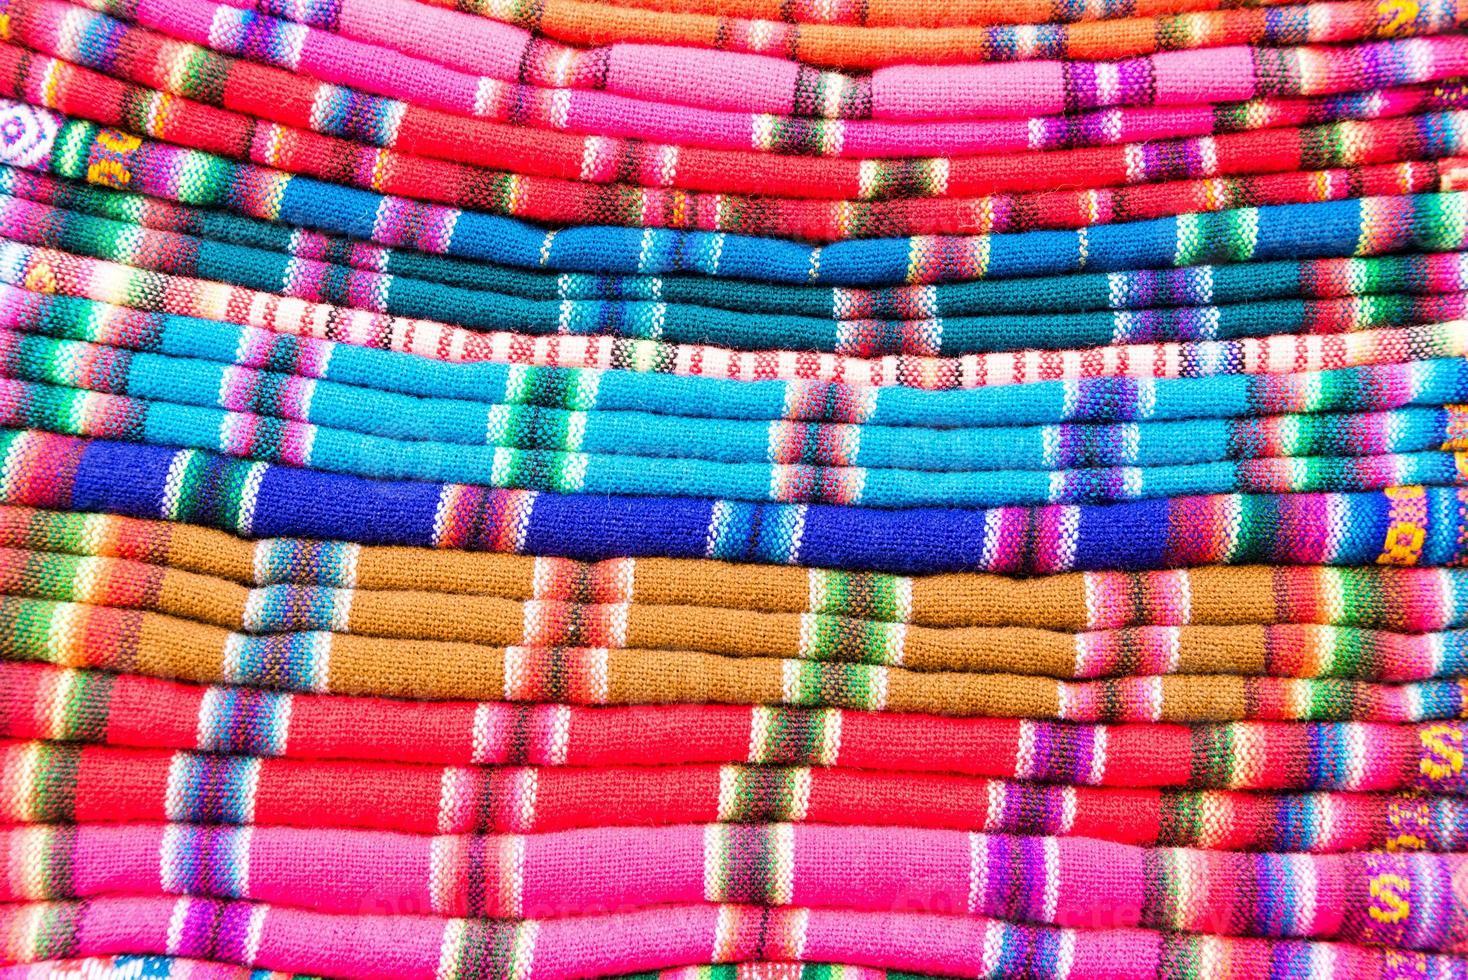 tessuti colorati foto